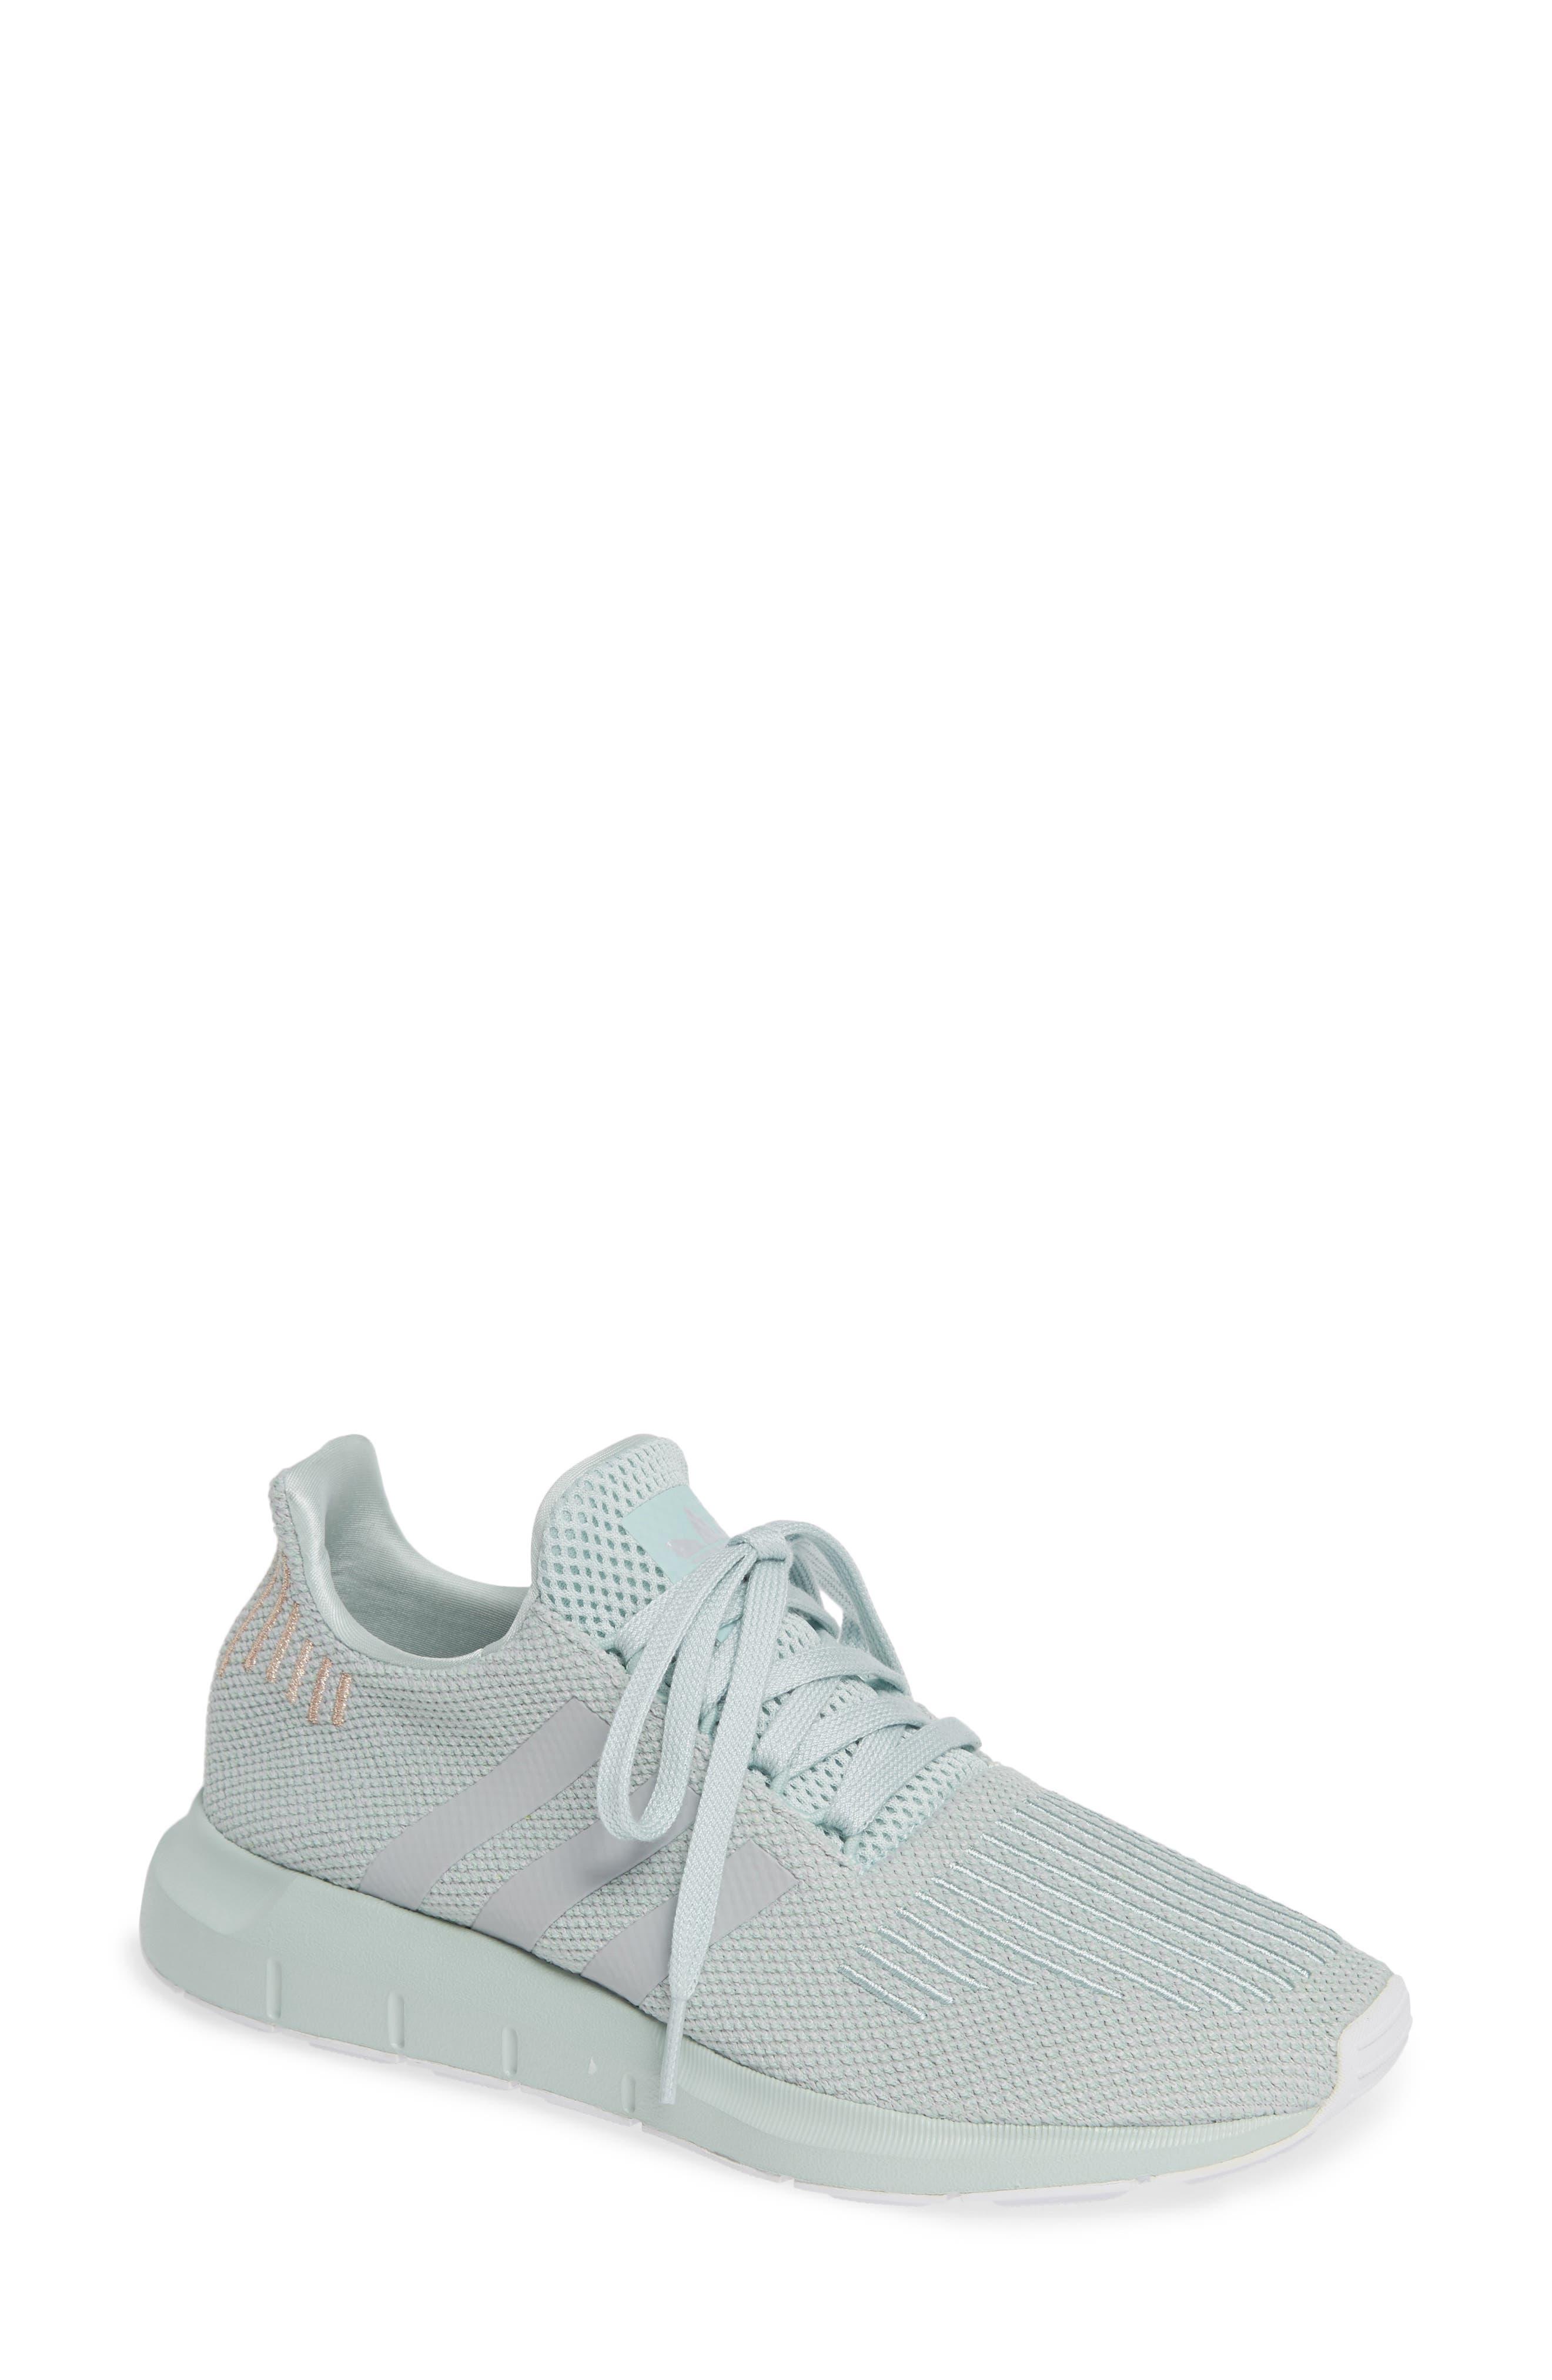 Swift Run Sneaker,                         Main,                         color,